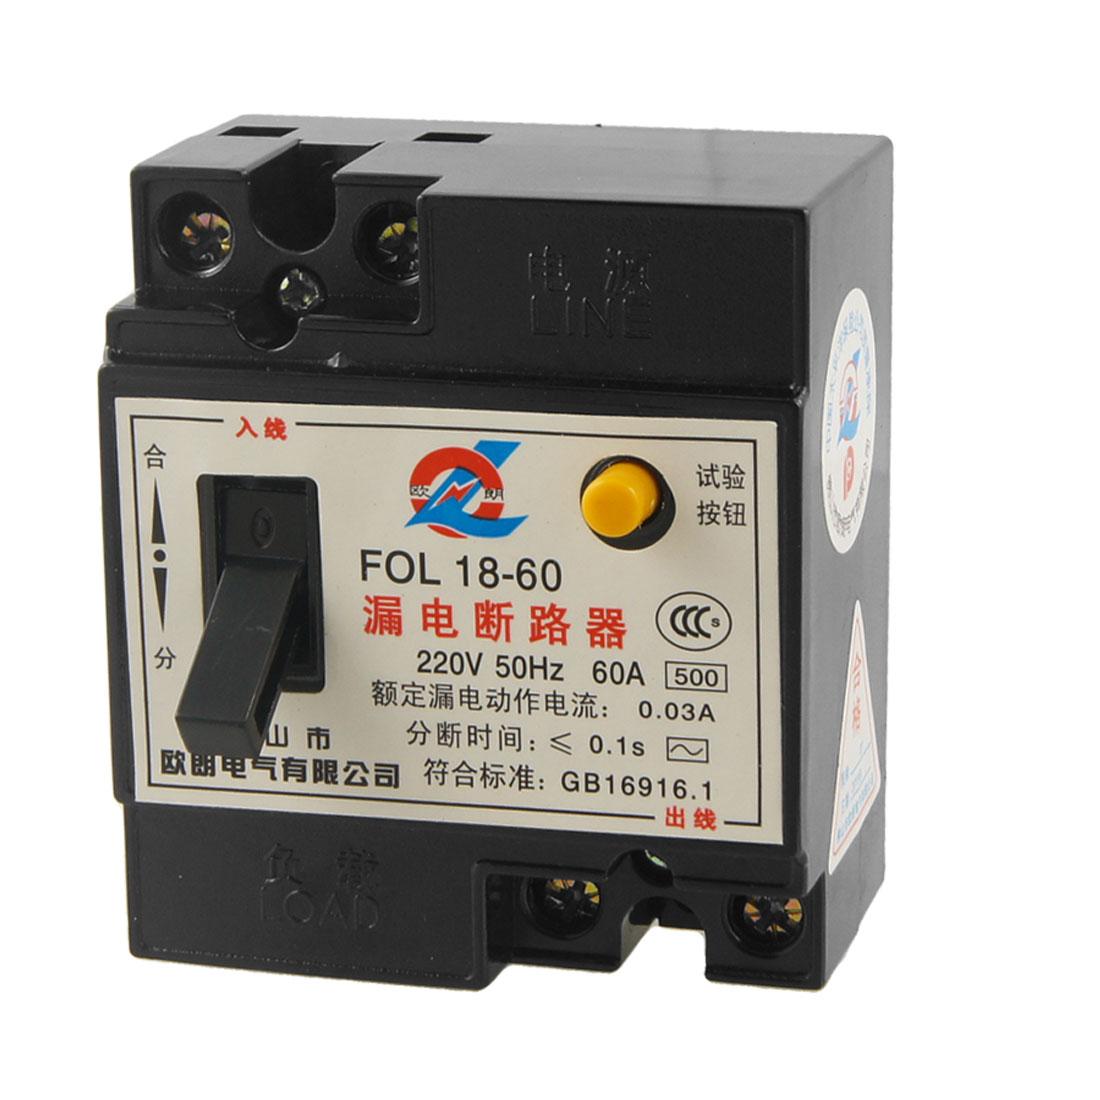 220V AC 60A 2P RCCB FOL18-60 Residual Current Circuit Breaker